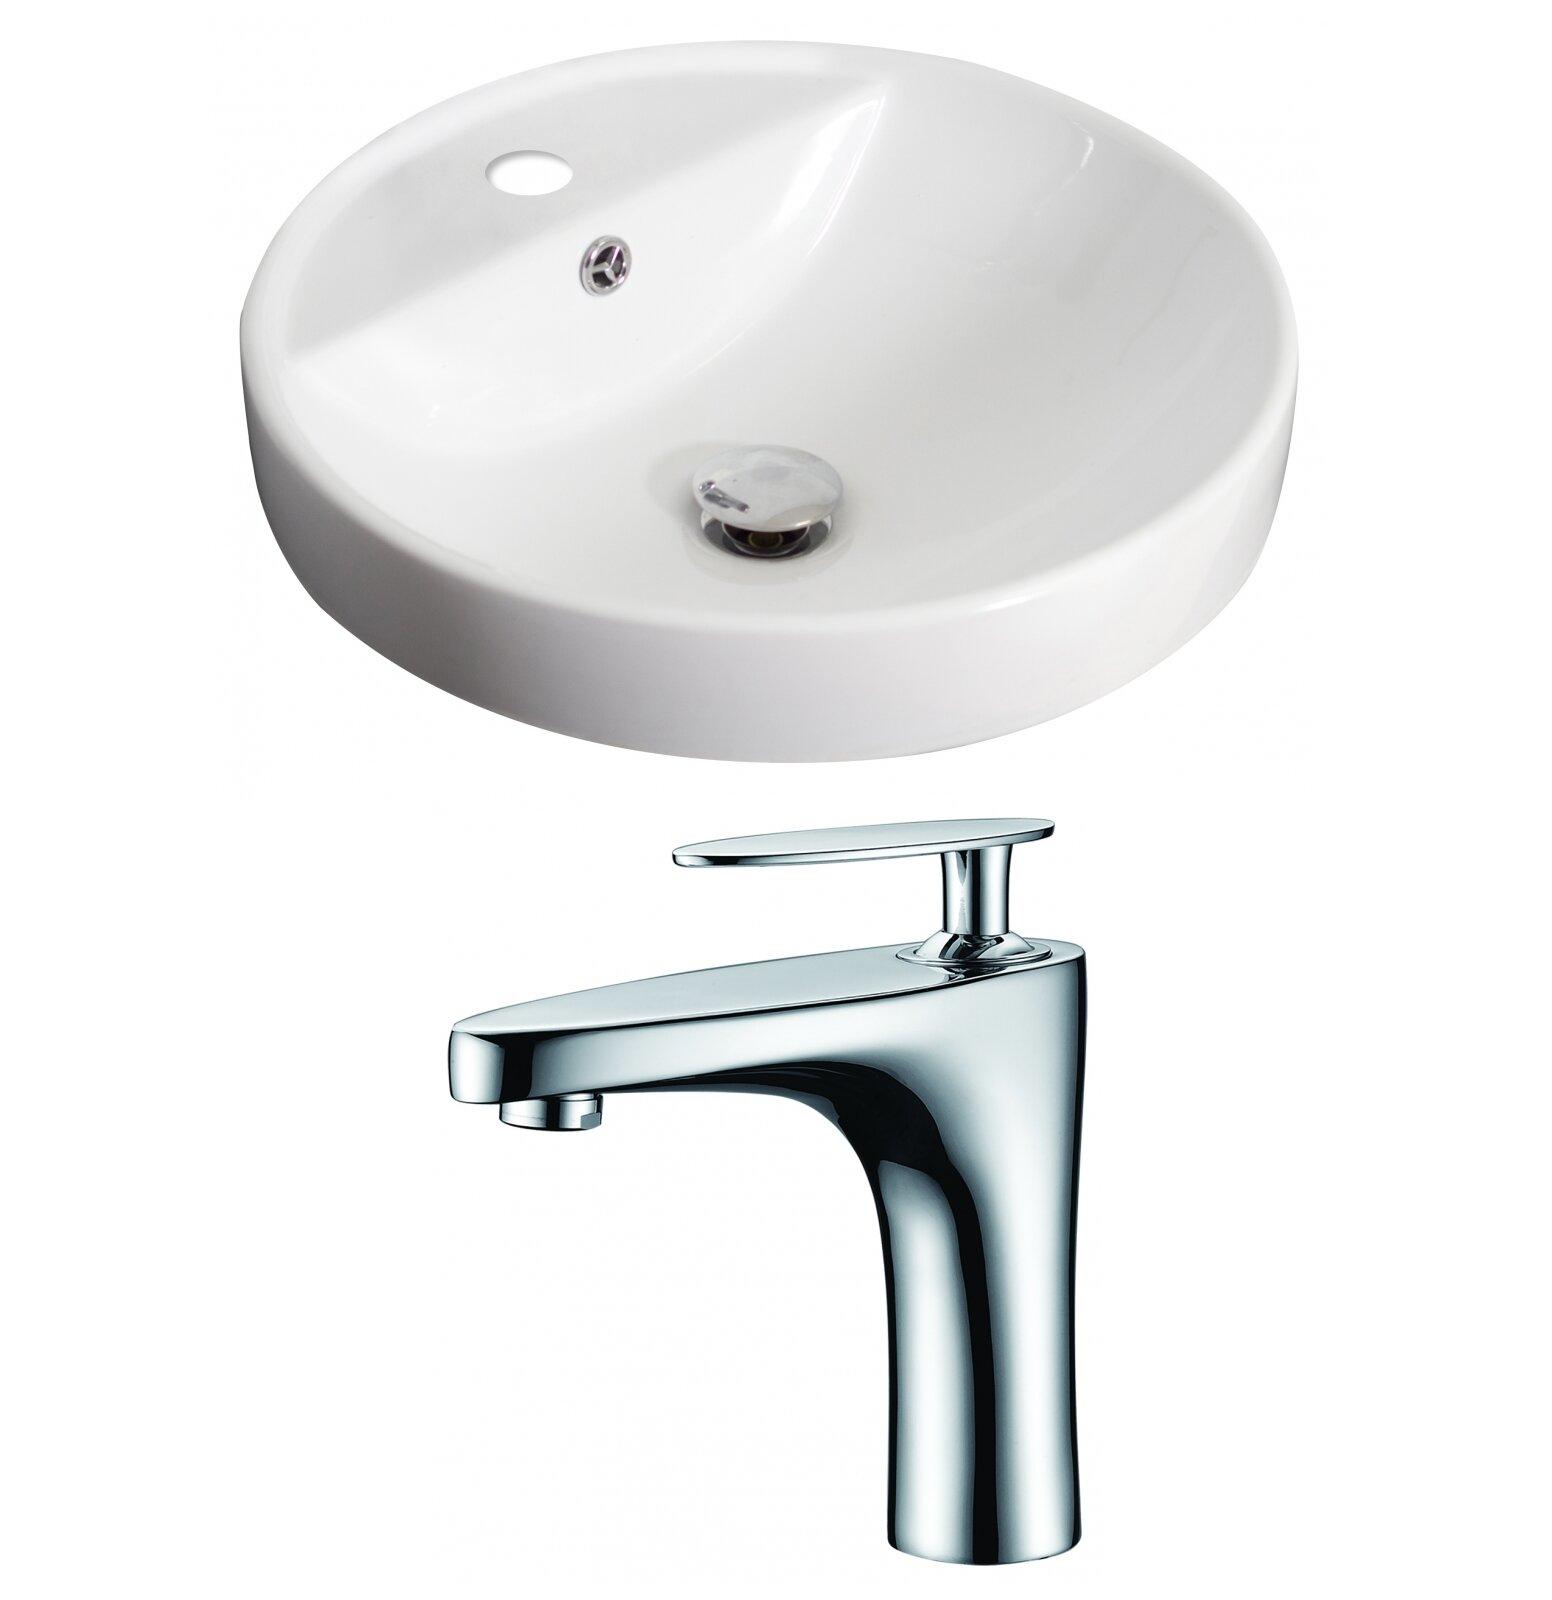 Avanities Ceramic Circular Drop In Bathroom Sink With Faucet And